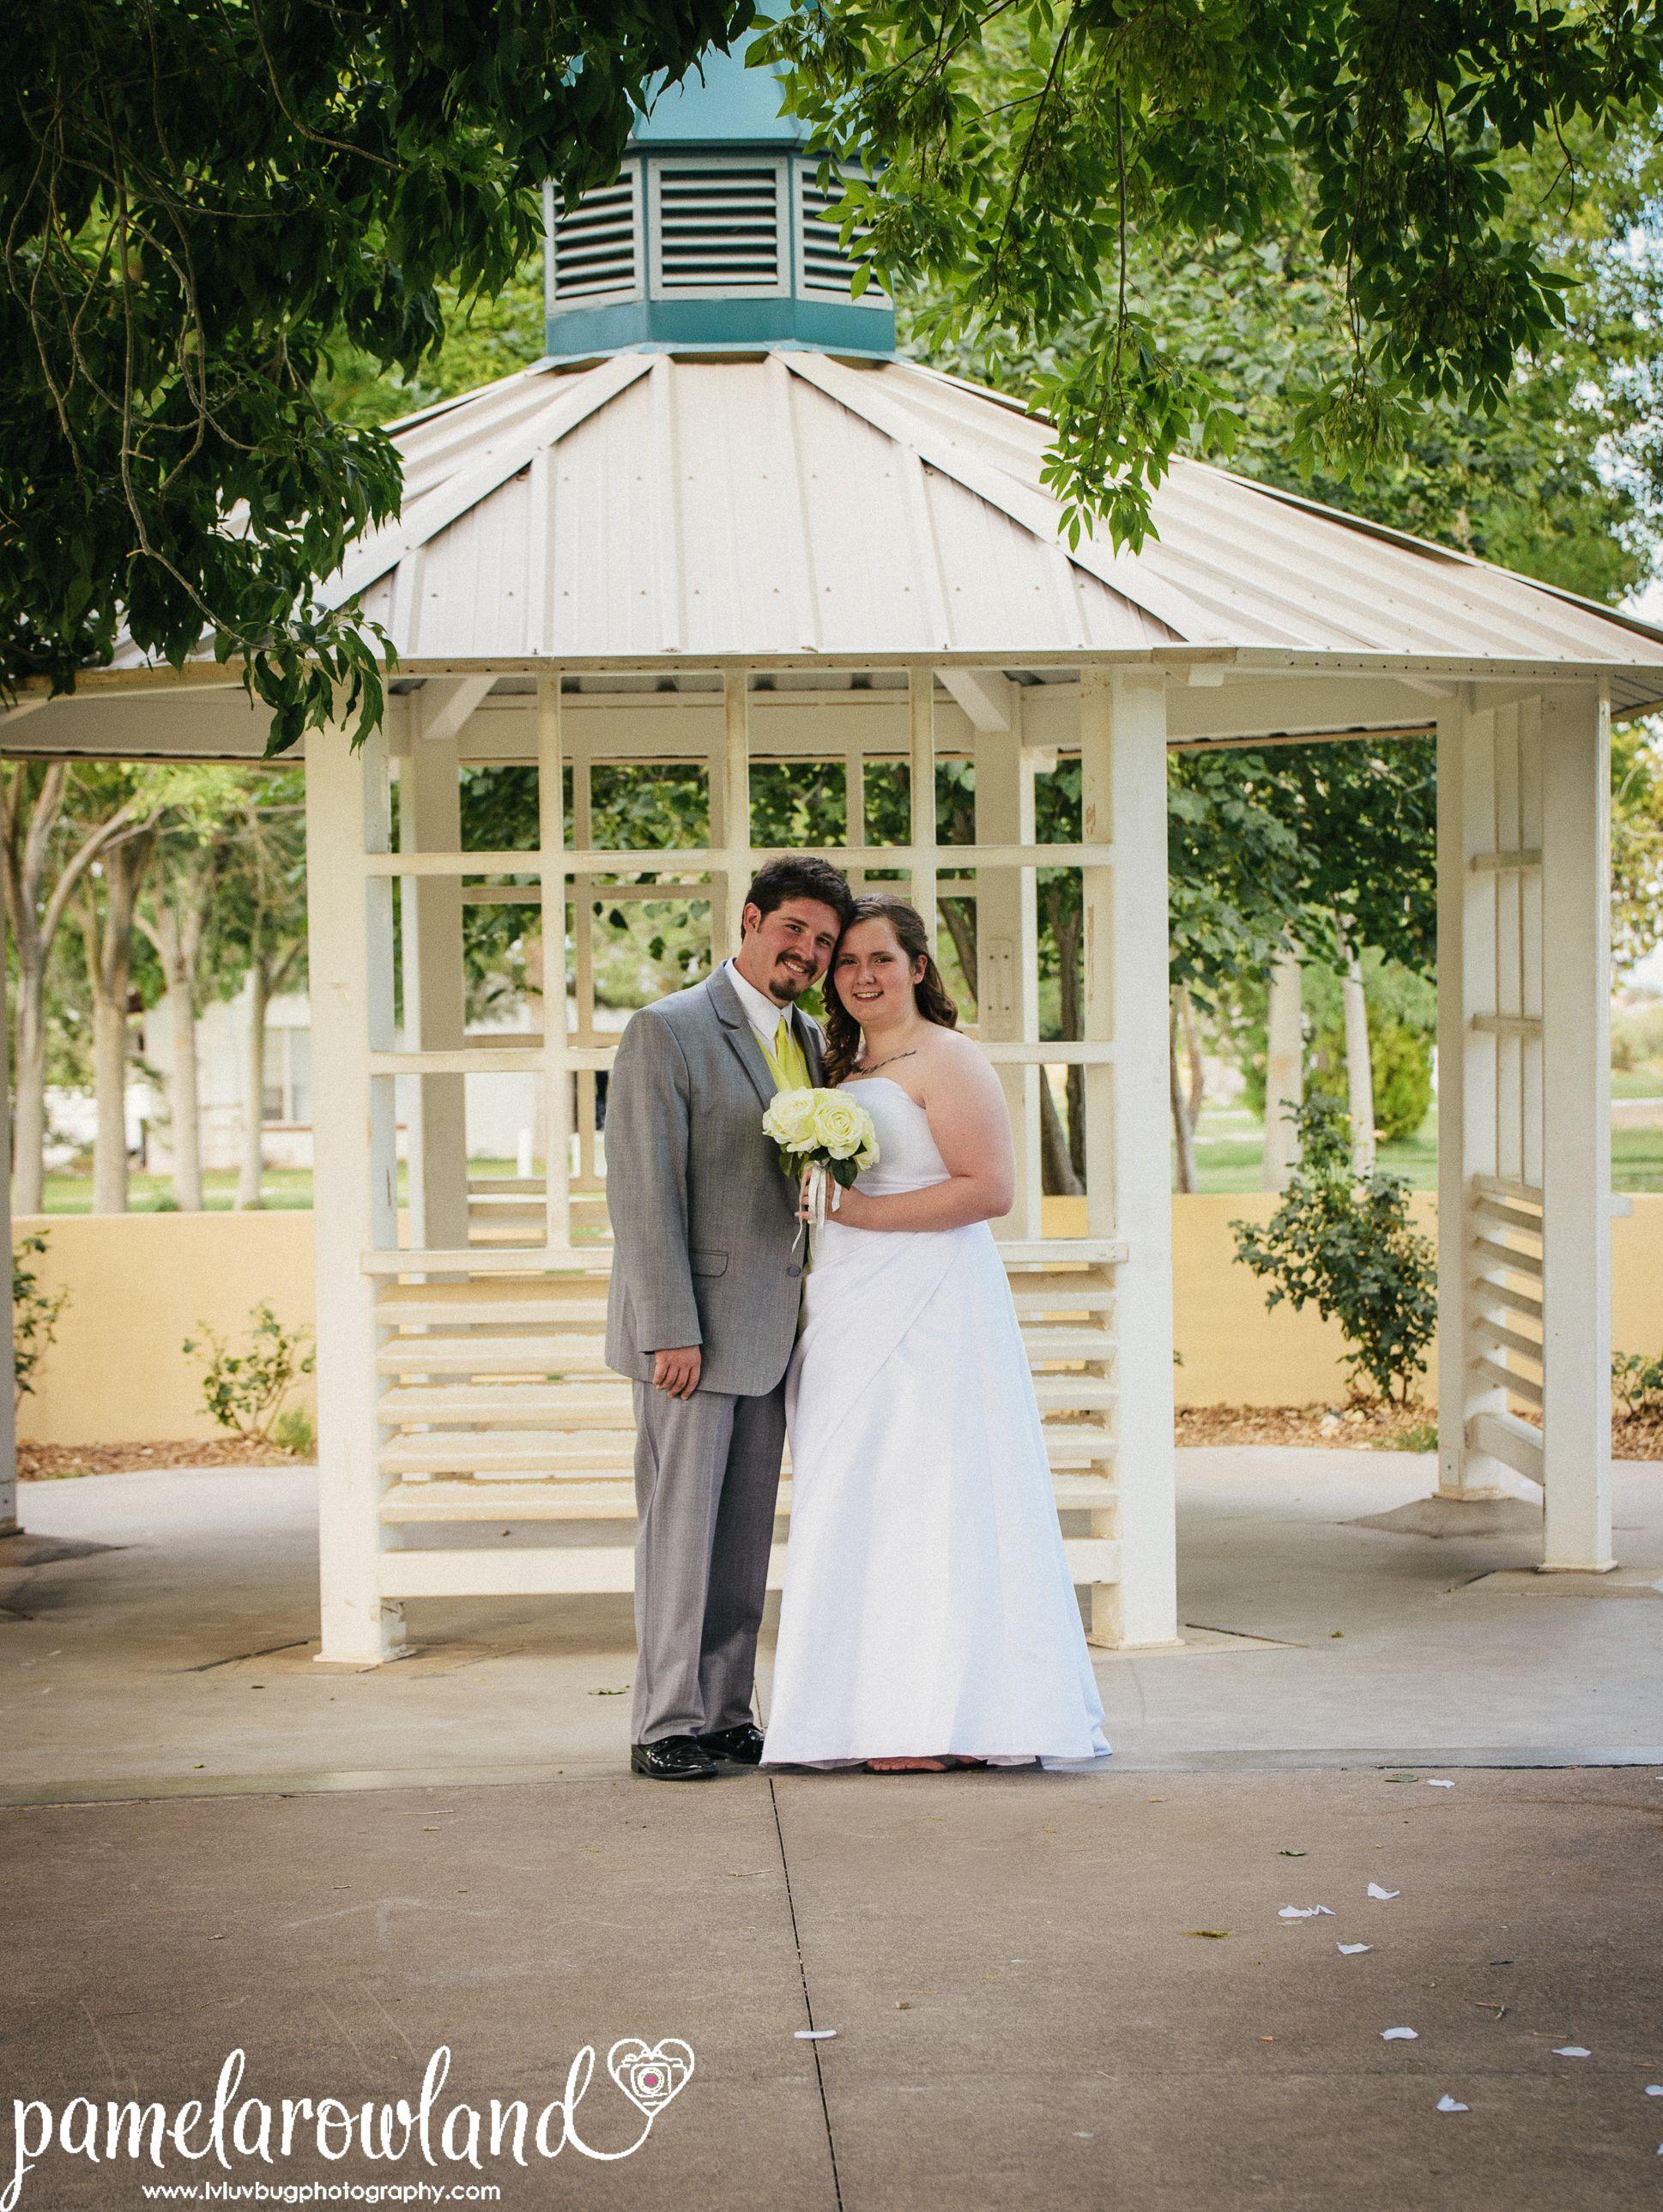 Pin On Las Vegas Strip Weddings Elopements